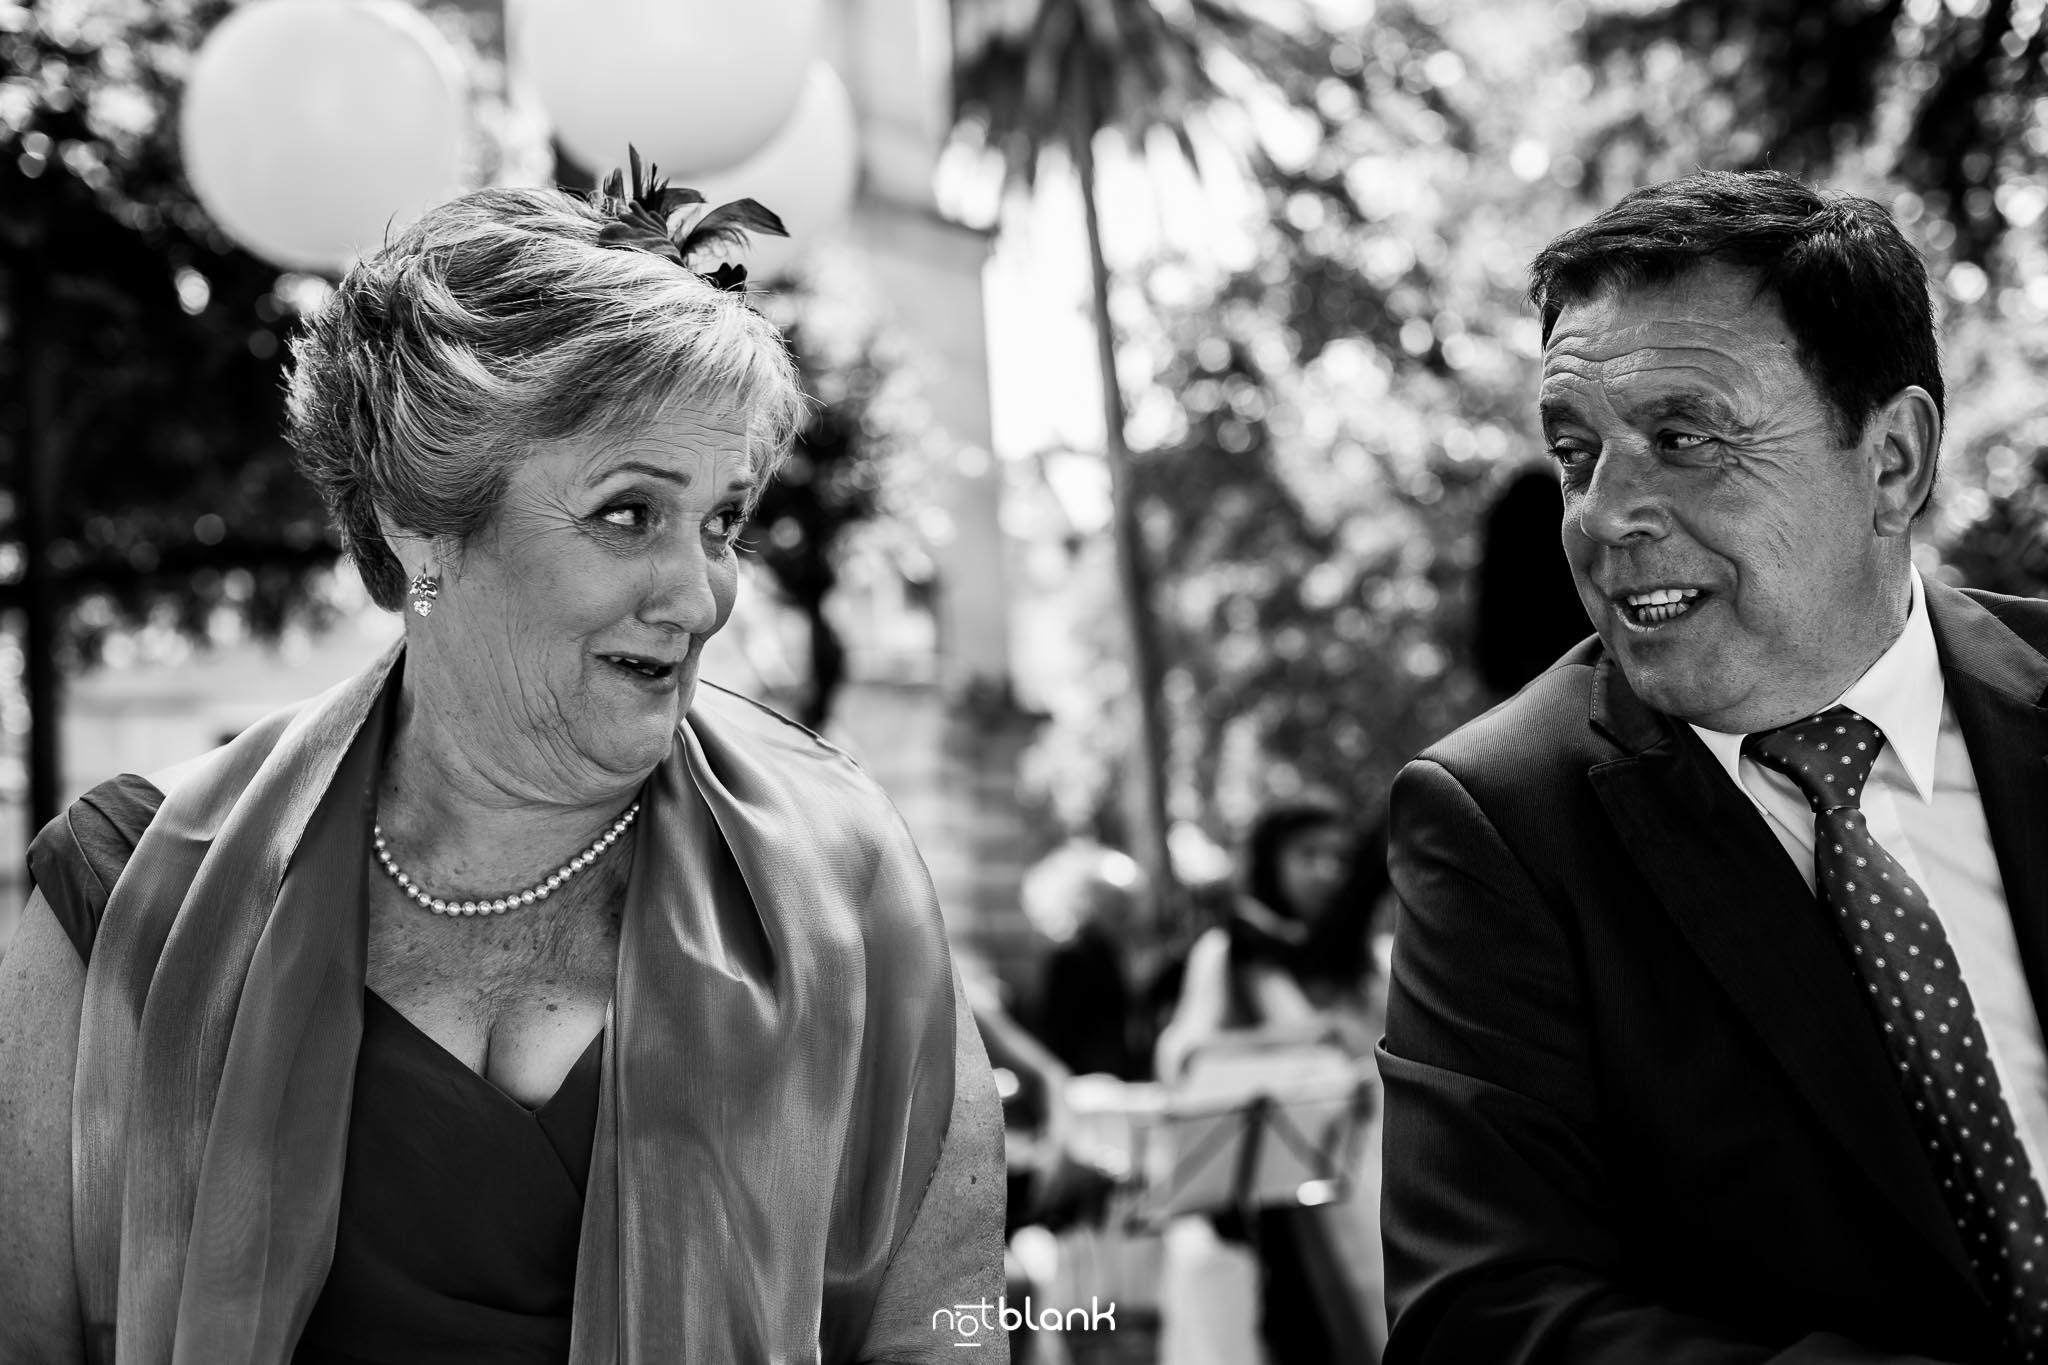 Notblank-Fiesta-Fotógrafo de boda-Mondariz-Balneario-Madrina-Padrino-Wedding Planner